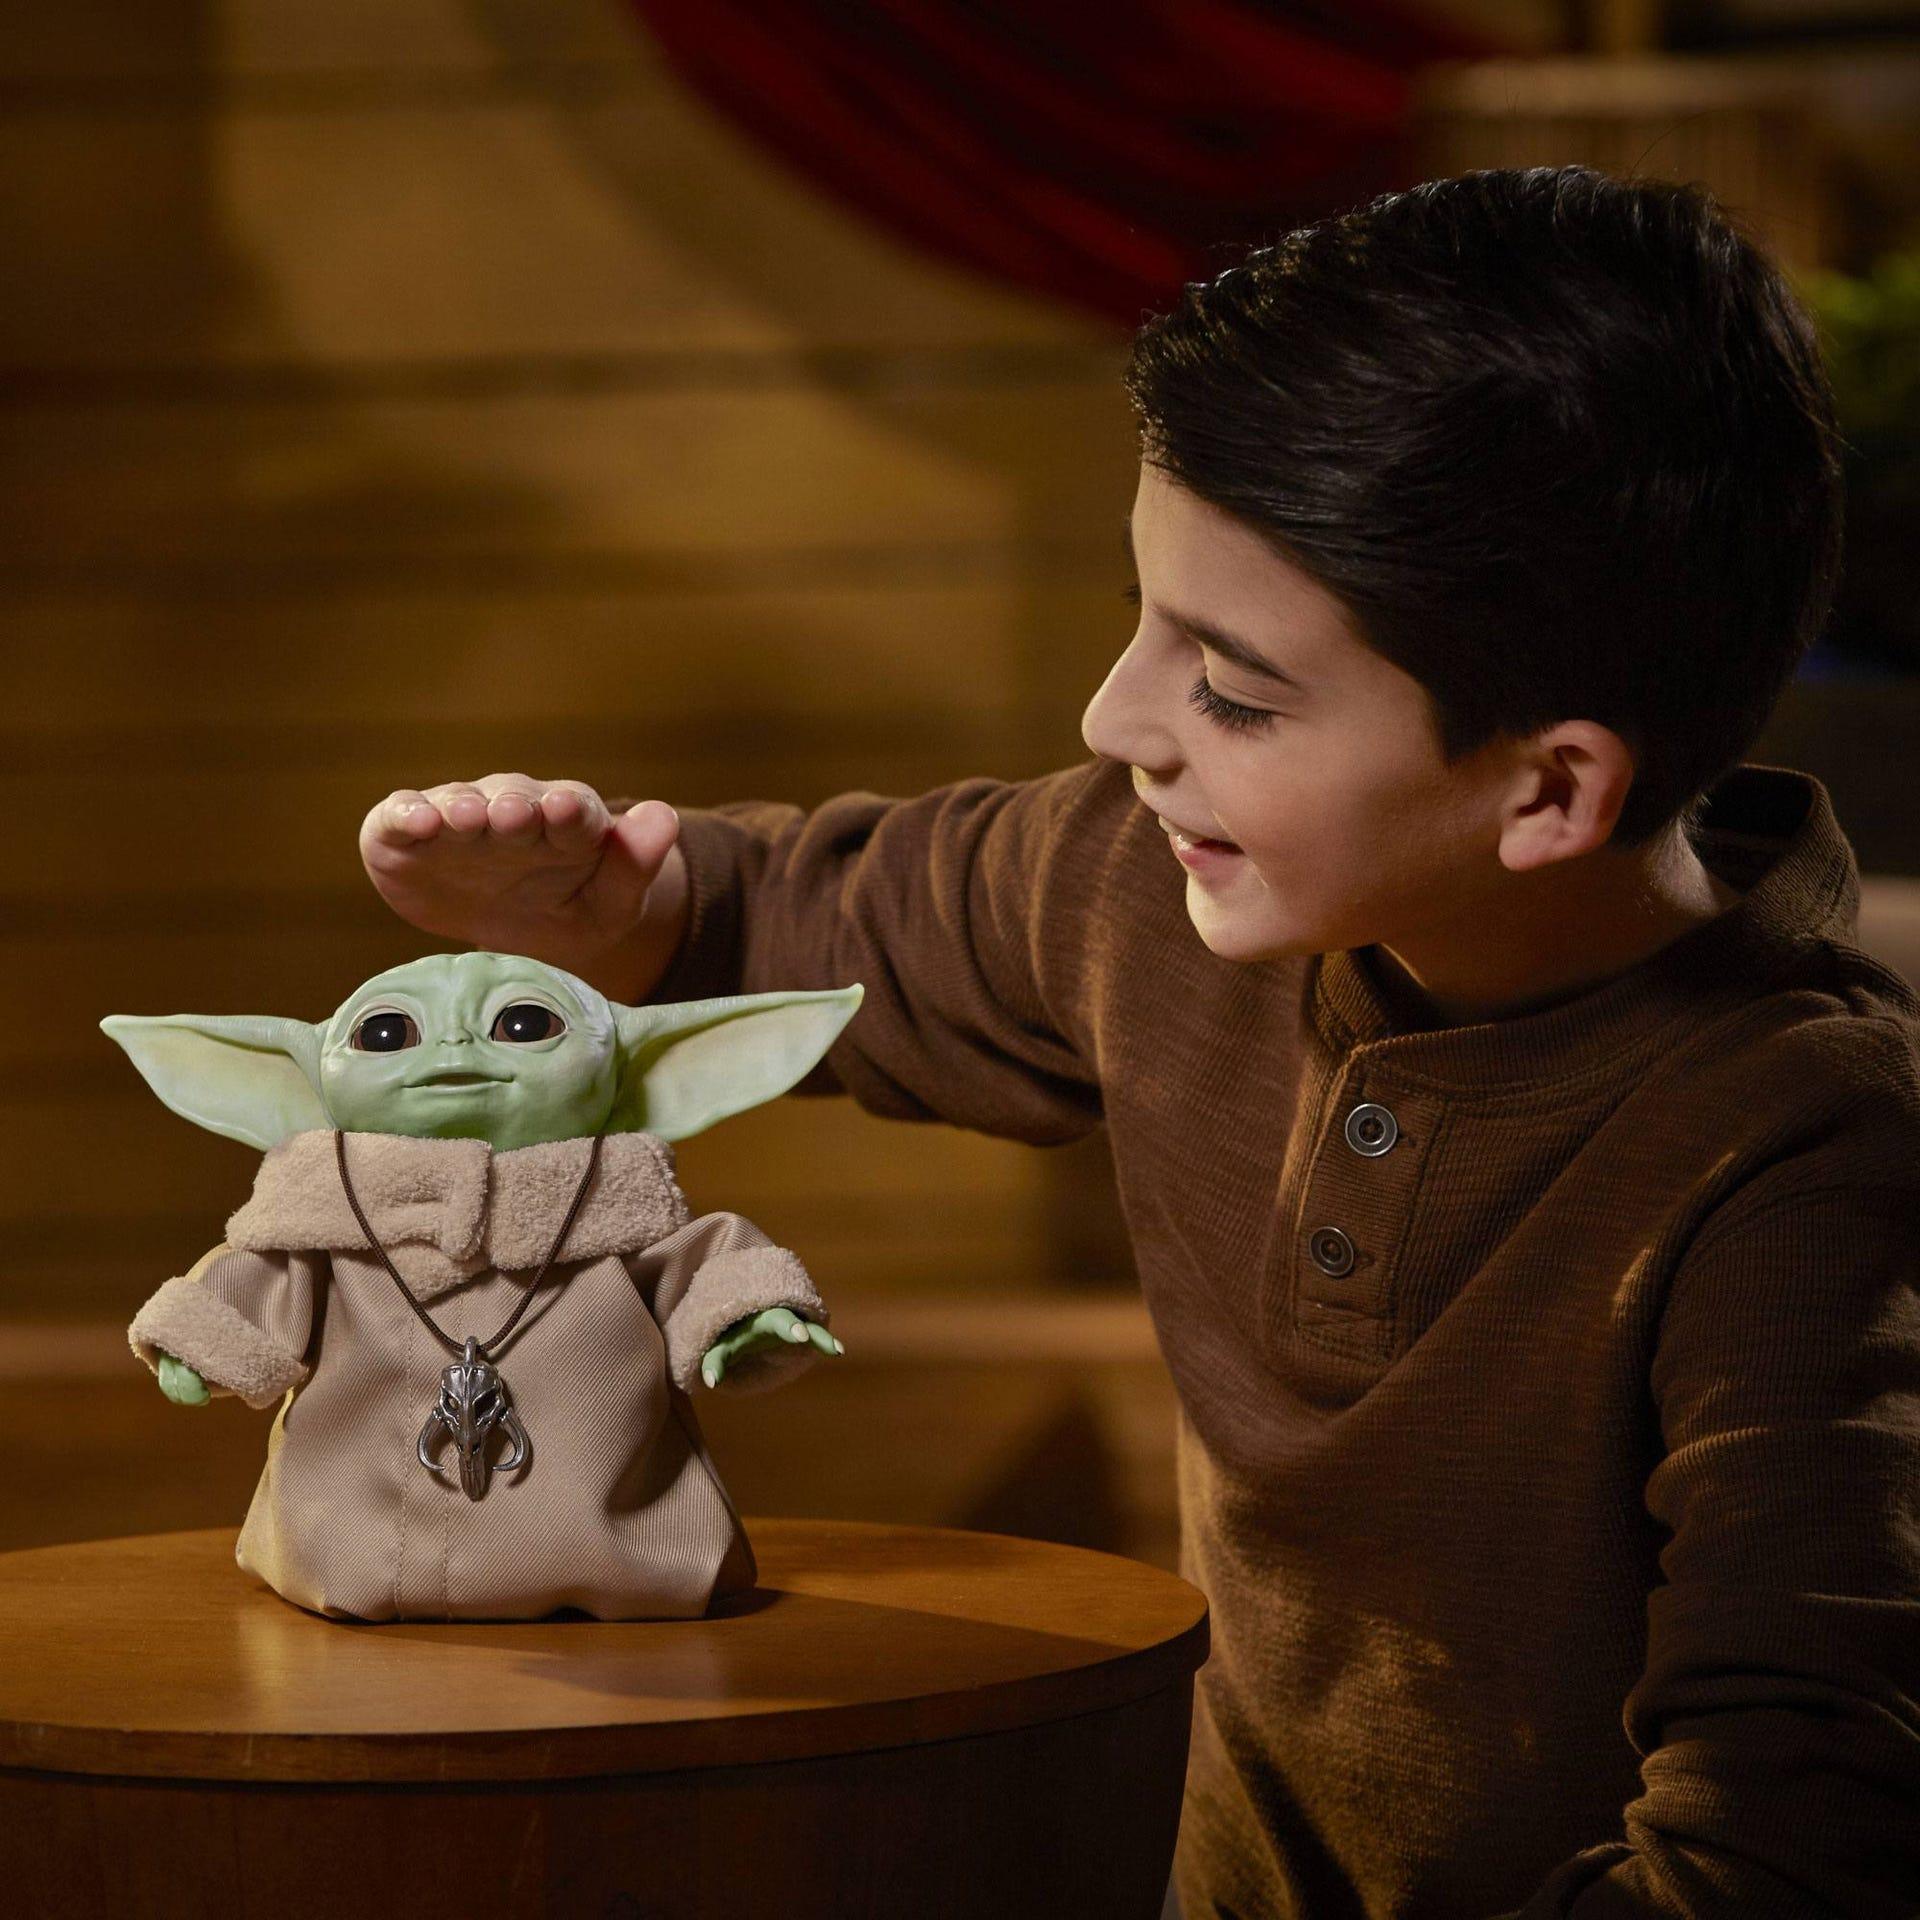 Star Wars The Mandalorian Elektronische Figur The Child Animatronic Edition F11195L00 5010993762163